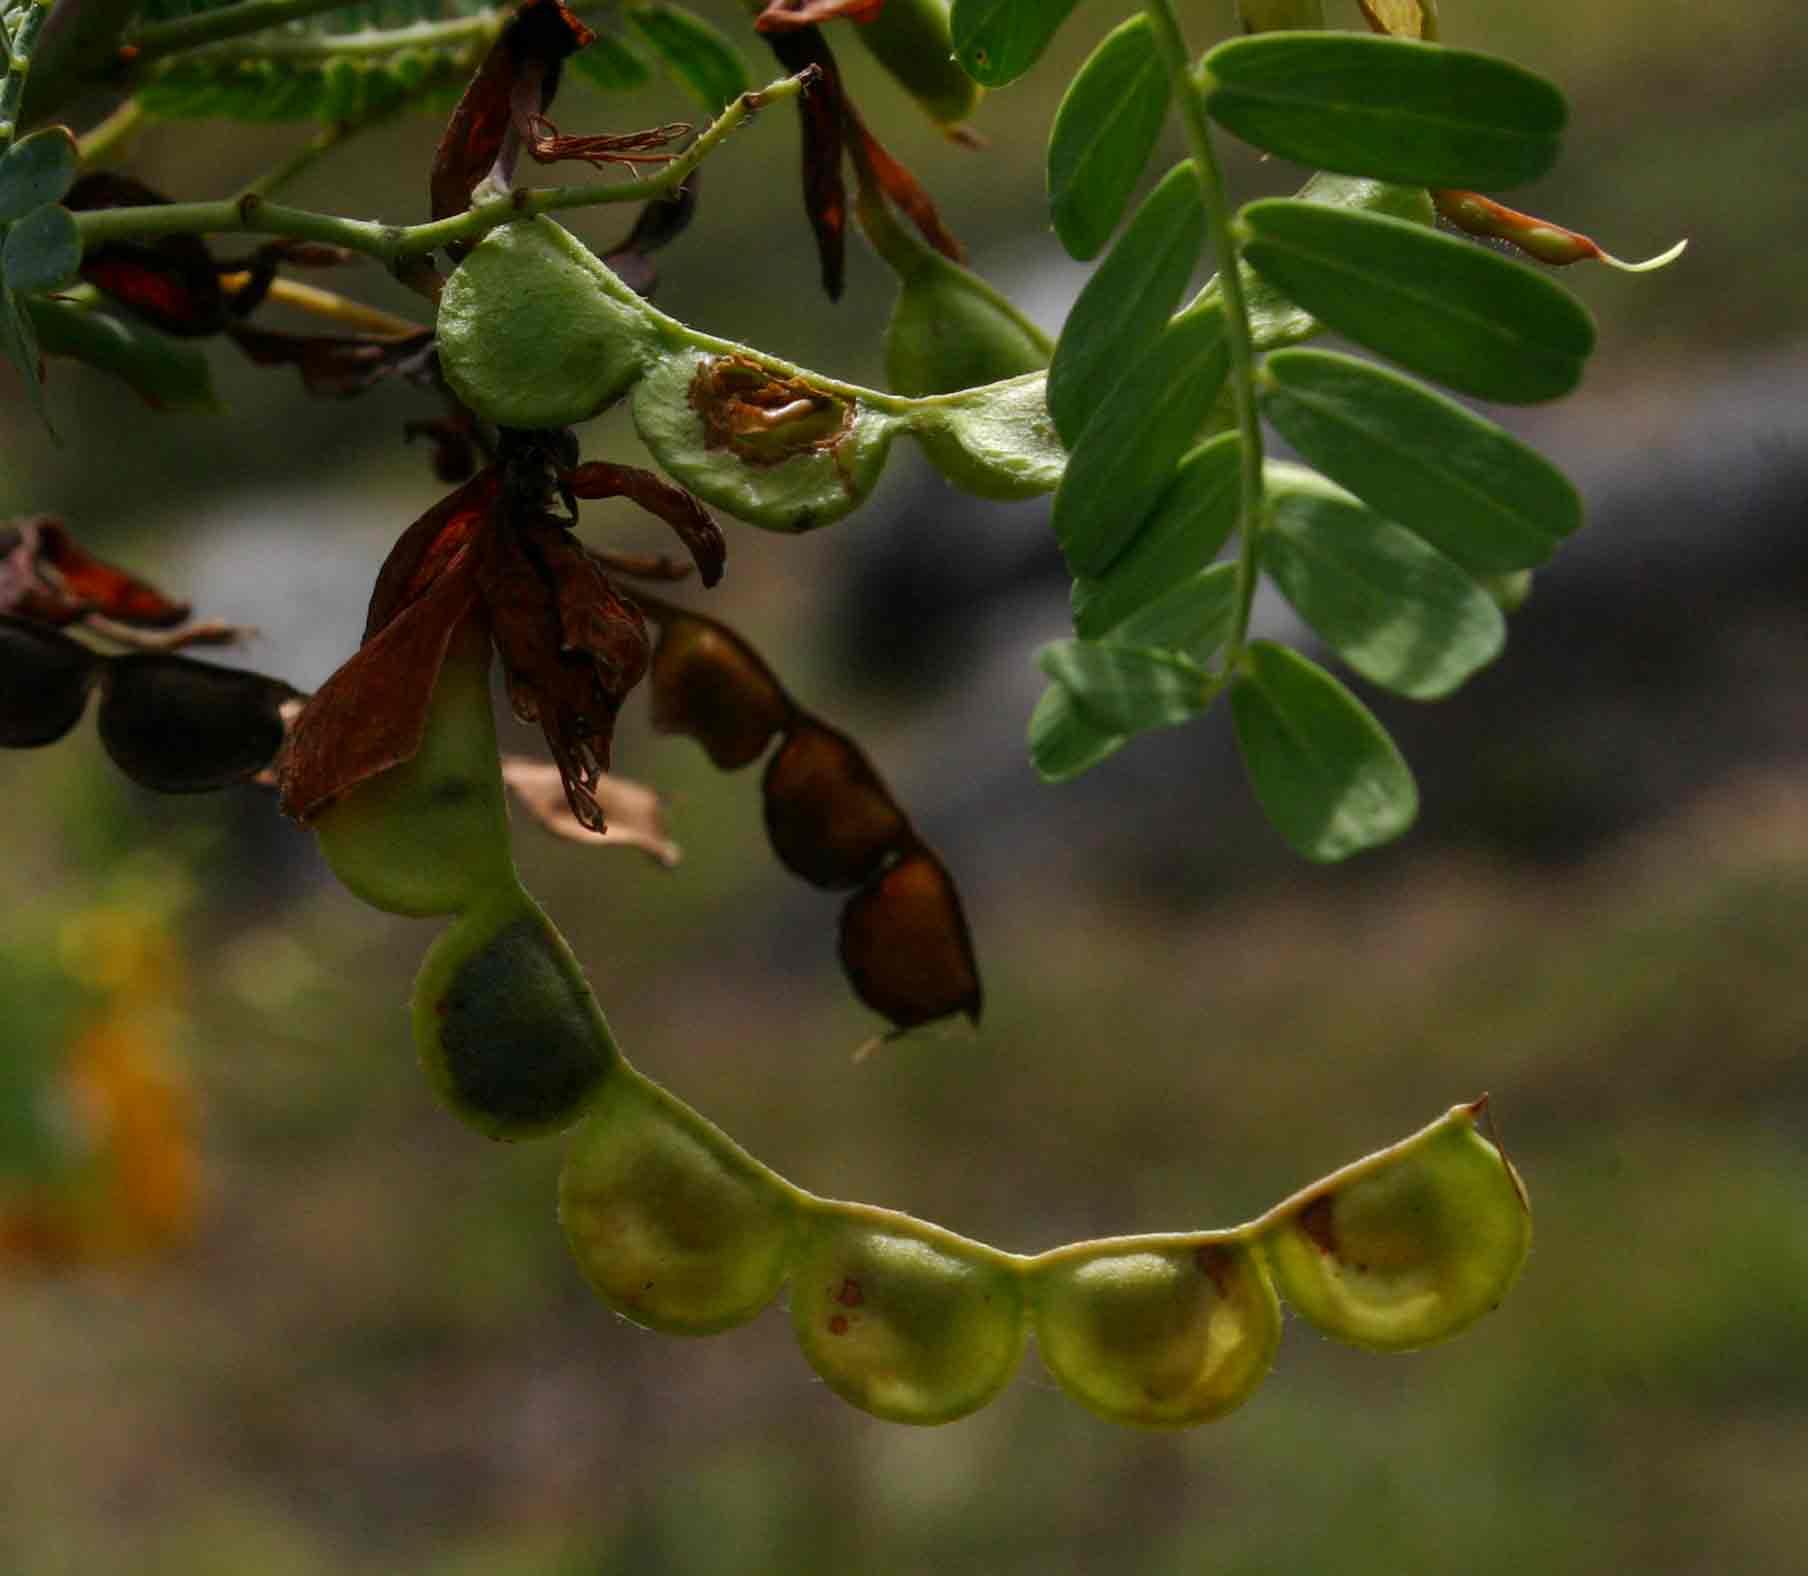 Aeschynomene nodulosa var. glabrescens